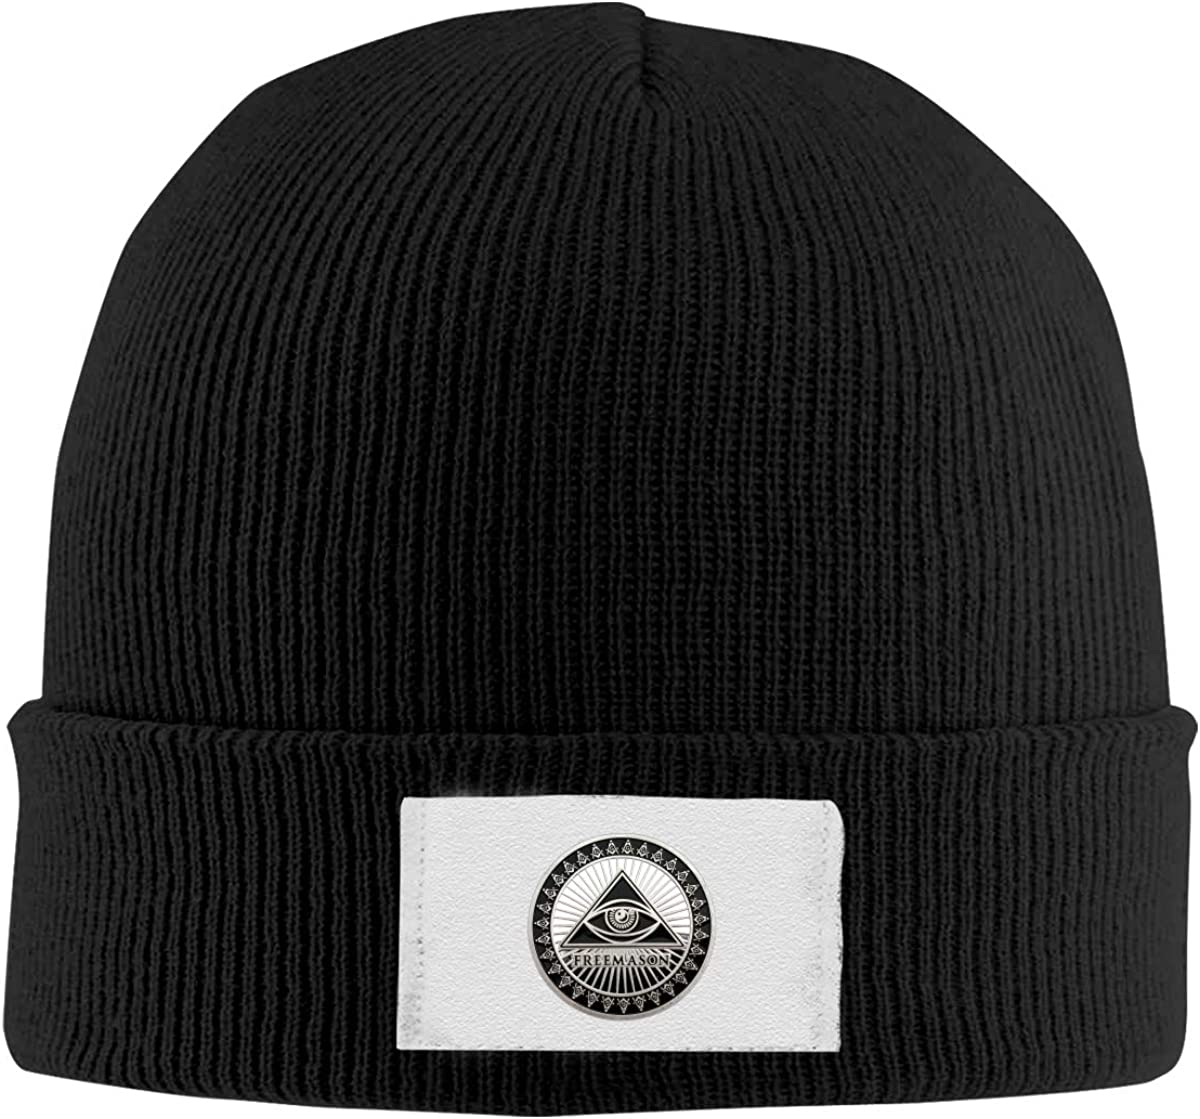 Stretchy Cuff Beanie Hat Black Dunpaiaa Skull Caps Freemason Masonic Silver Coin Winter Warm Knit Hats